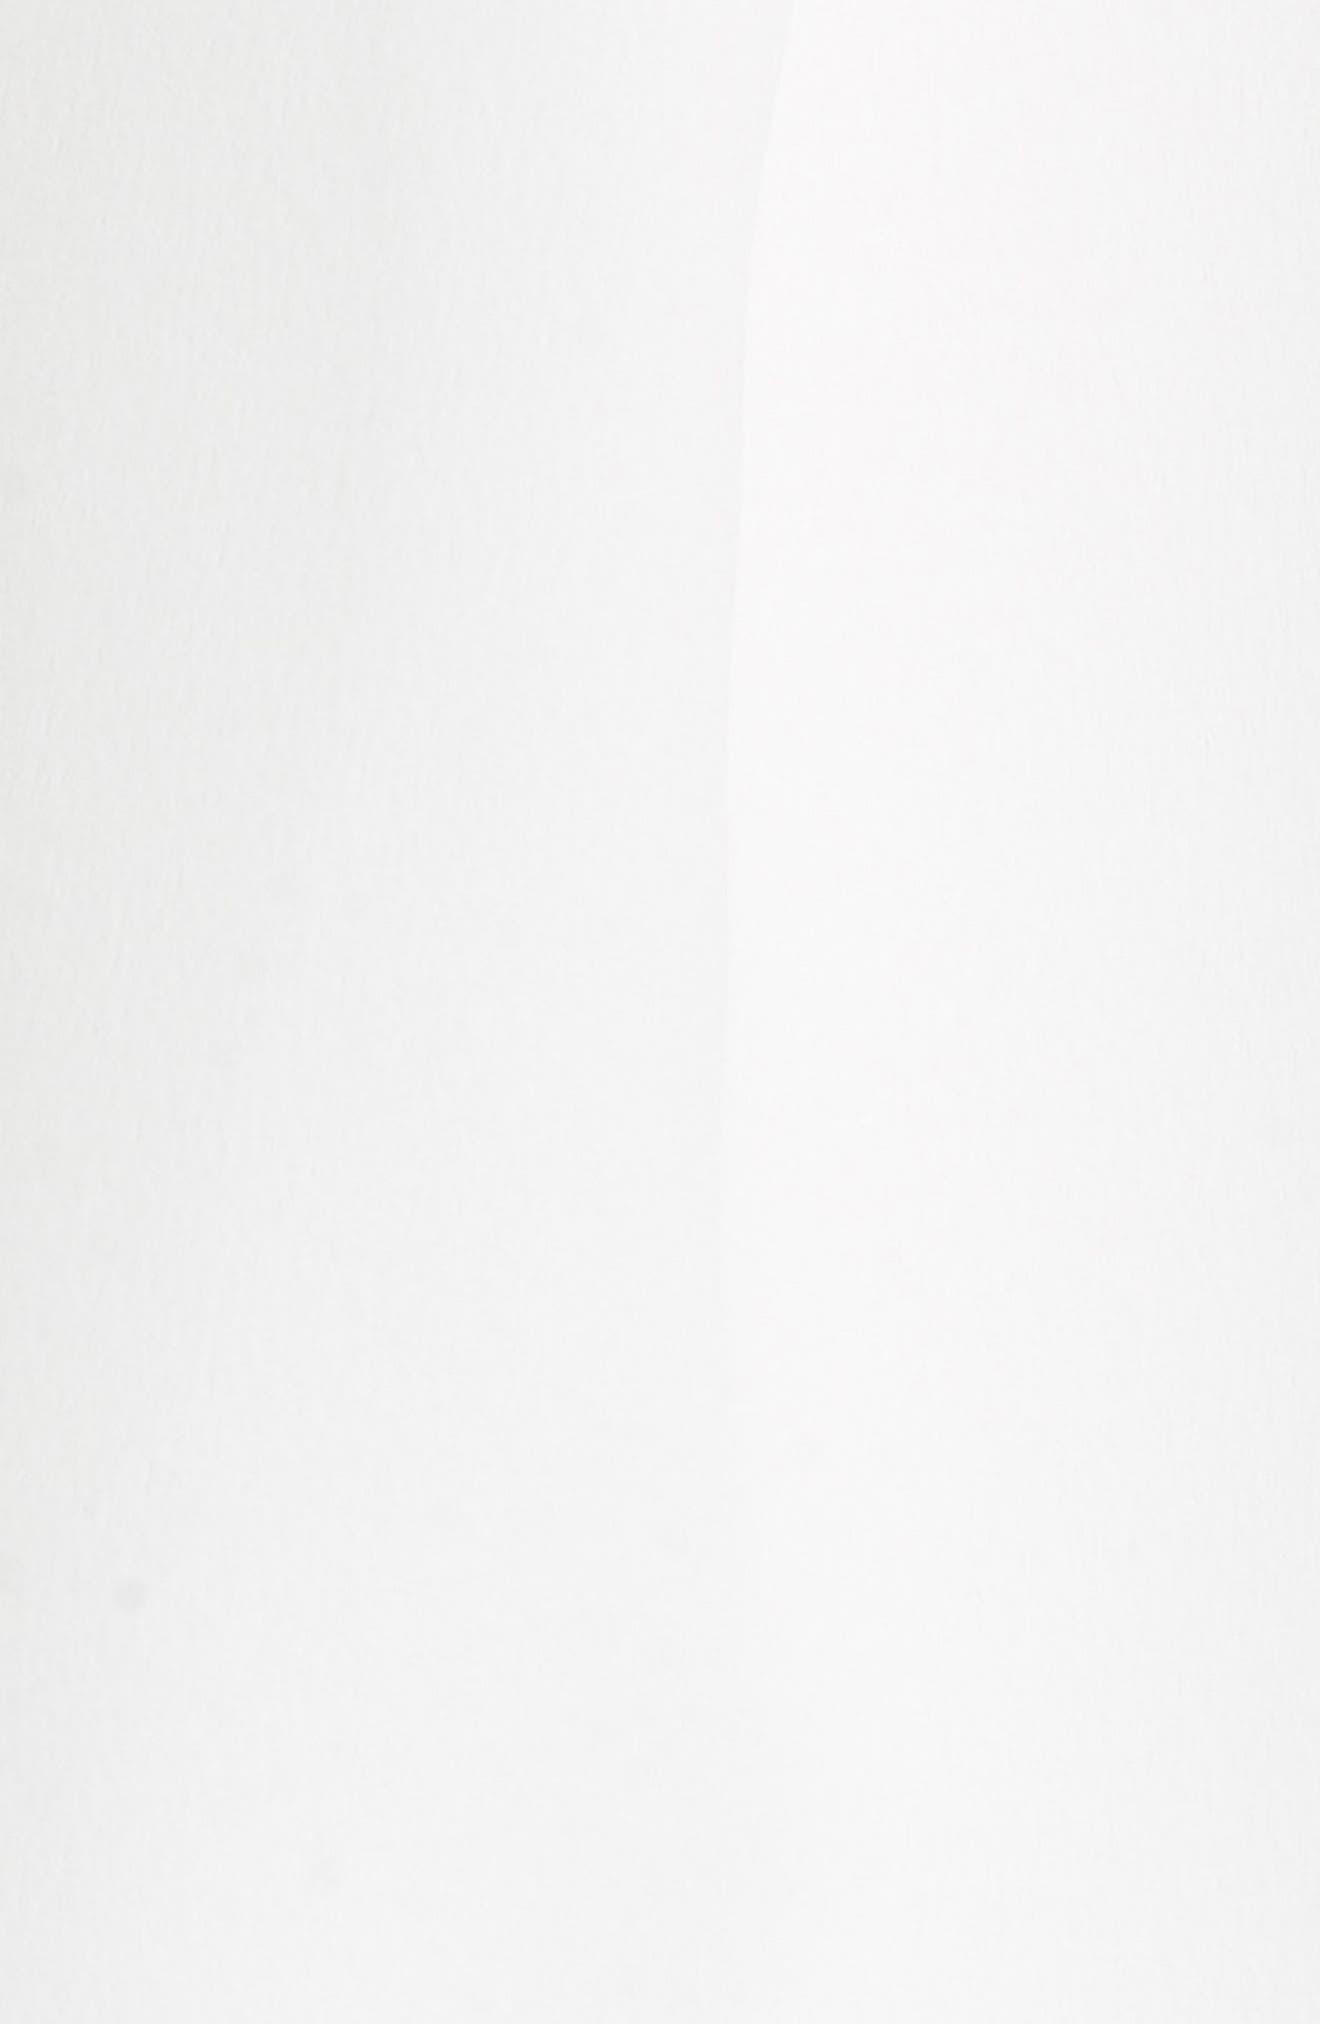 Embellished Neck A-Line Tunic Dress,                             Alternate thumbnail 5, color,                             White